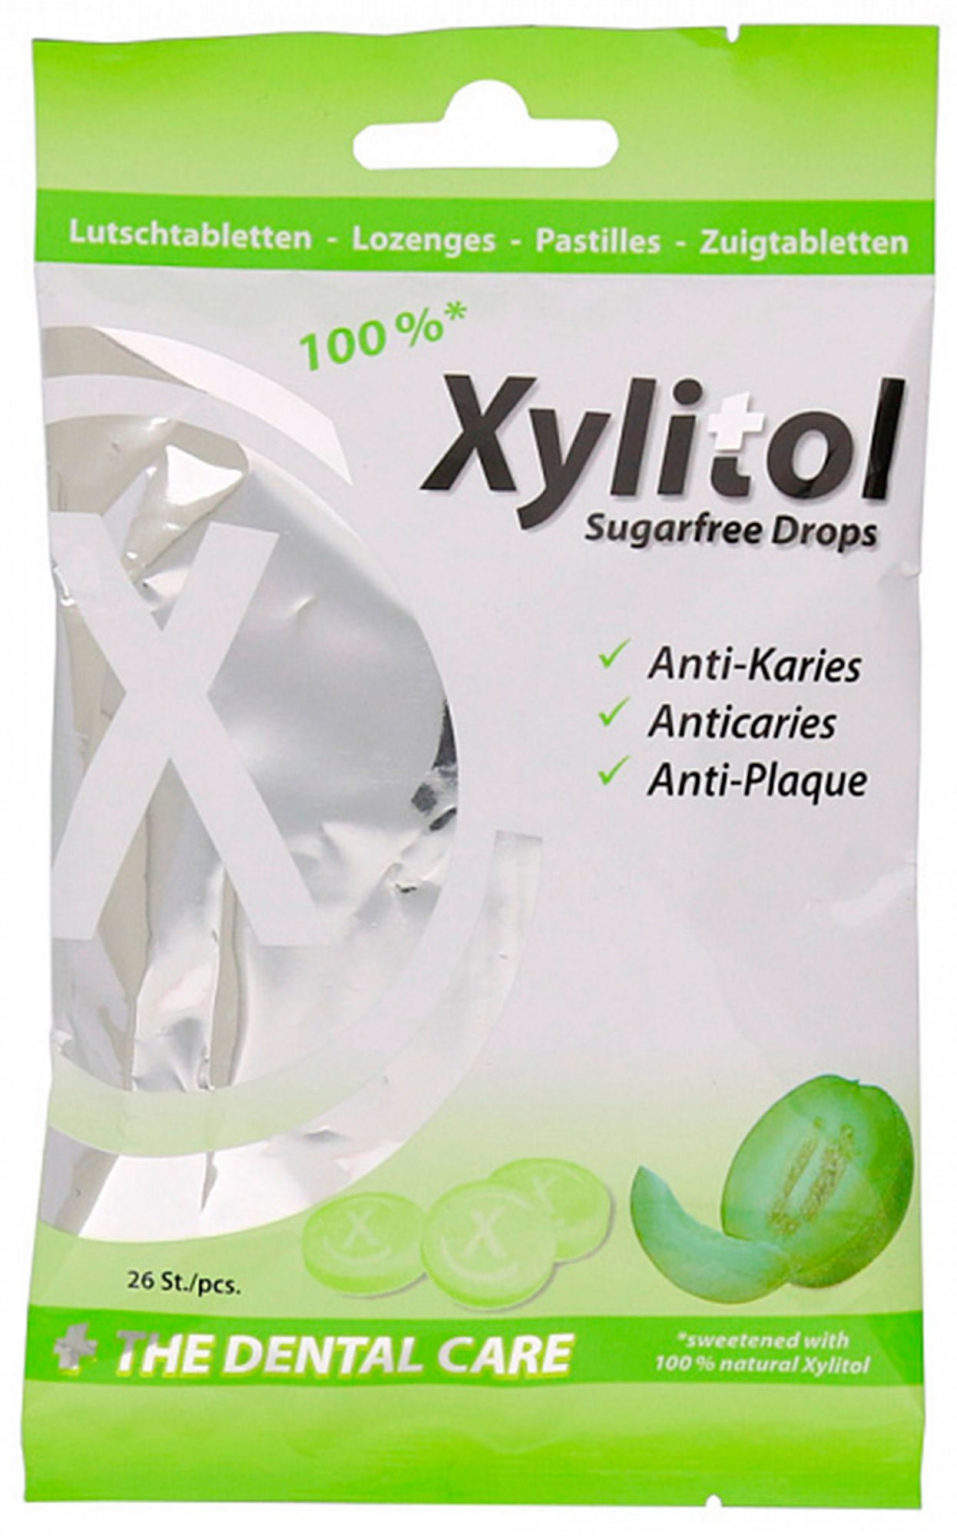 Леденцы miradent Xylitol Drops дыня, 26 шт